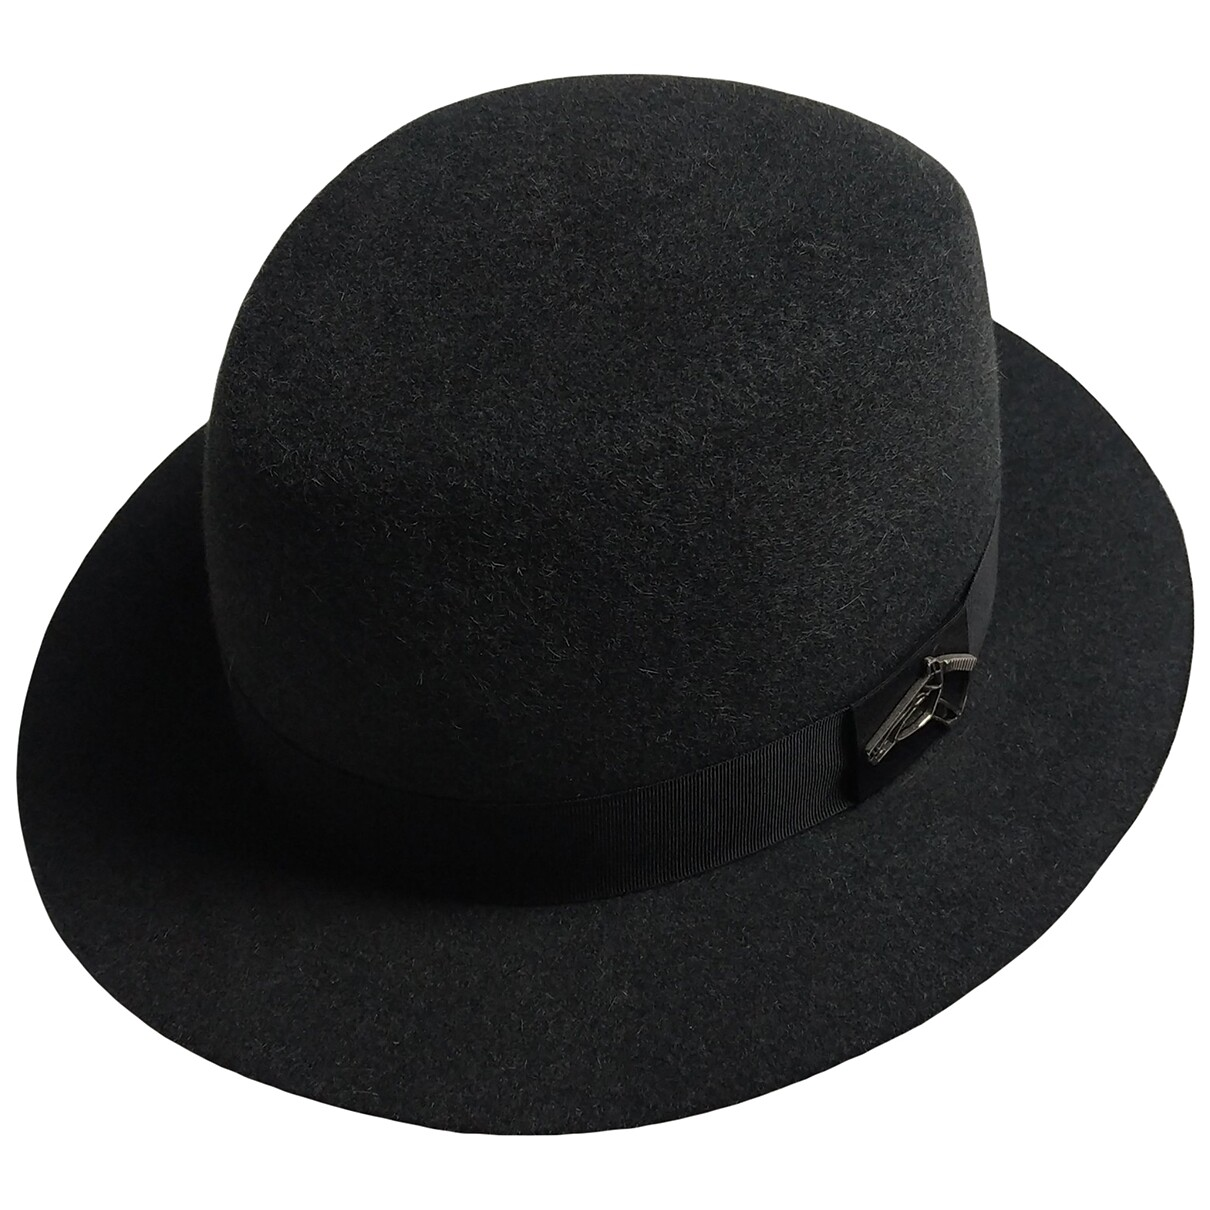 Hermès Wool hat with Horse logo